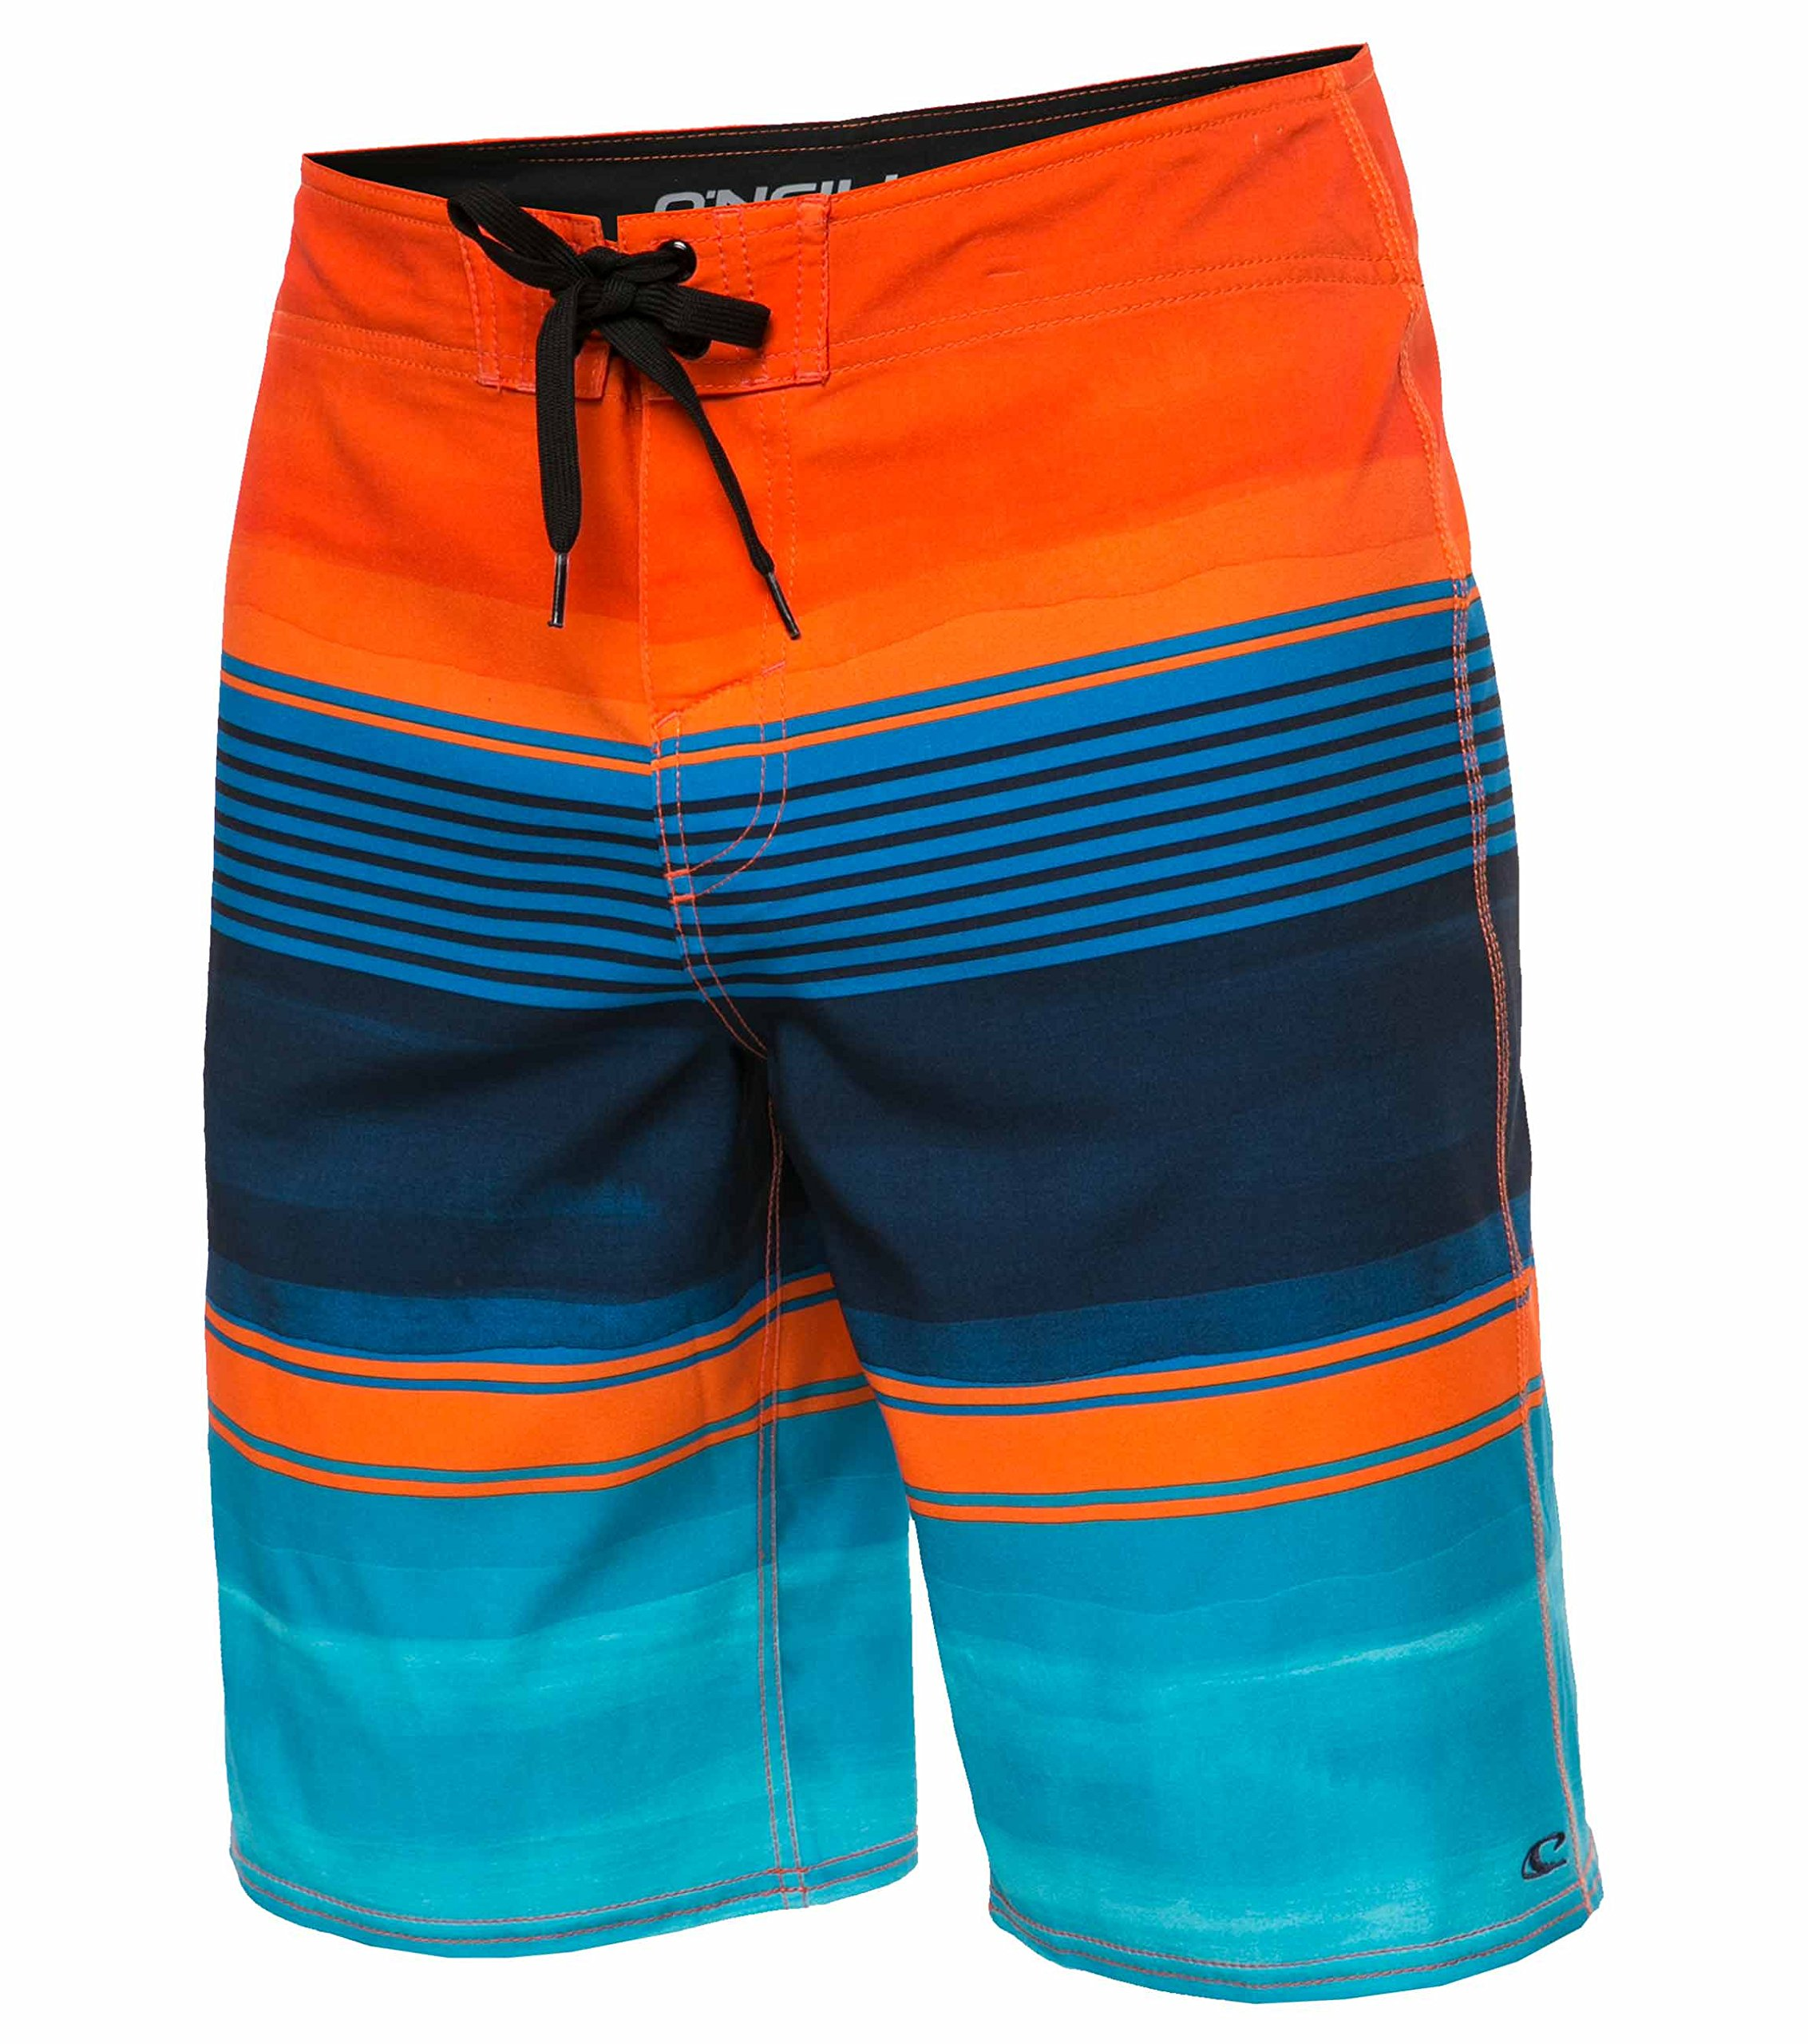 31262ad9c4 Galleon - O'Neill Men's Brisbane Lennox Board Shorts - Brisbane Orange,  Size 32